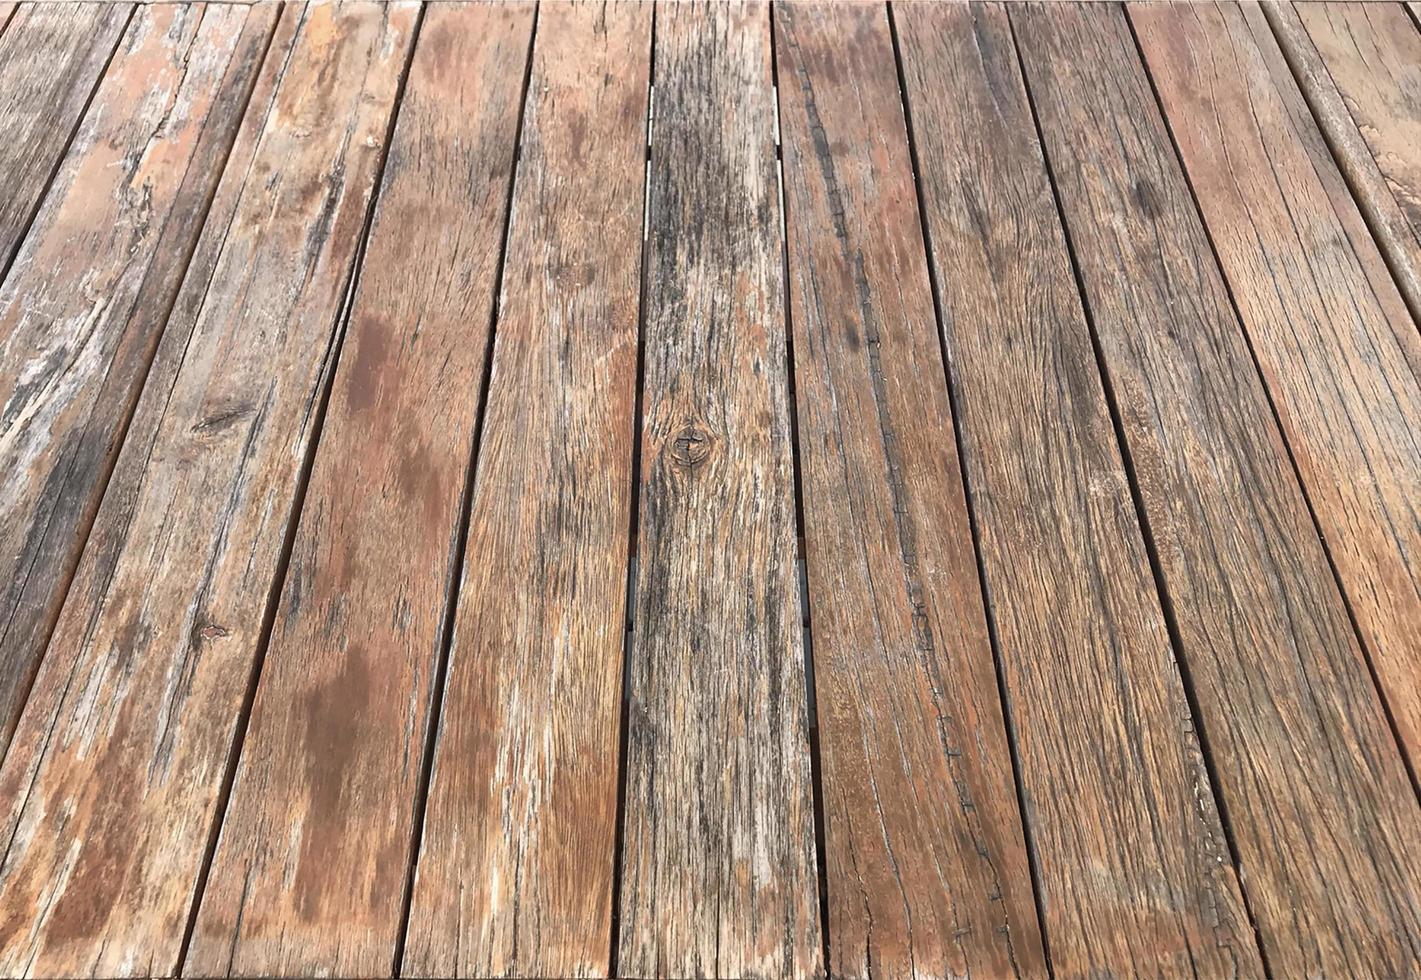 textura de madera arenosa foto